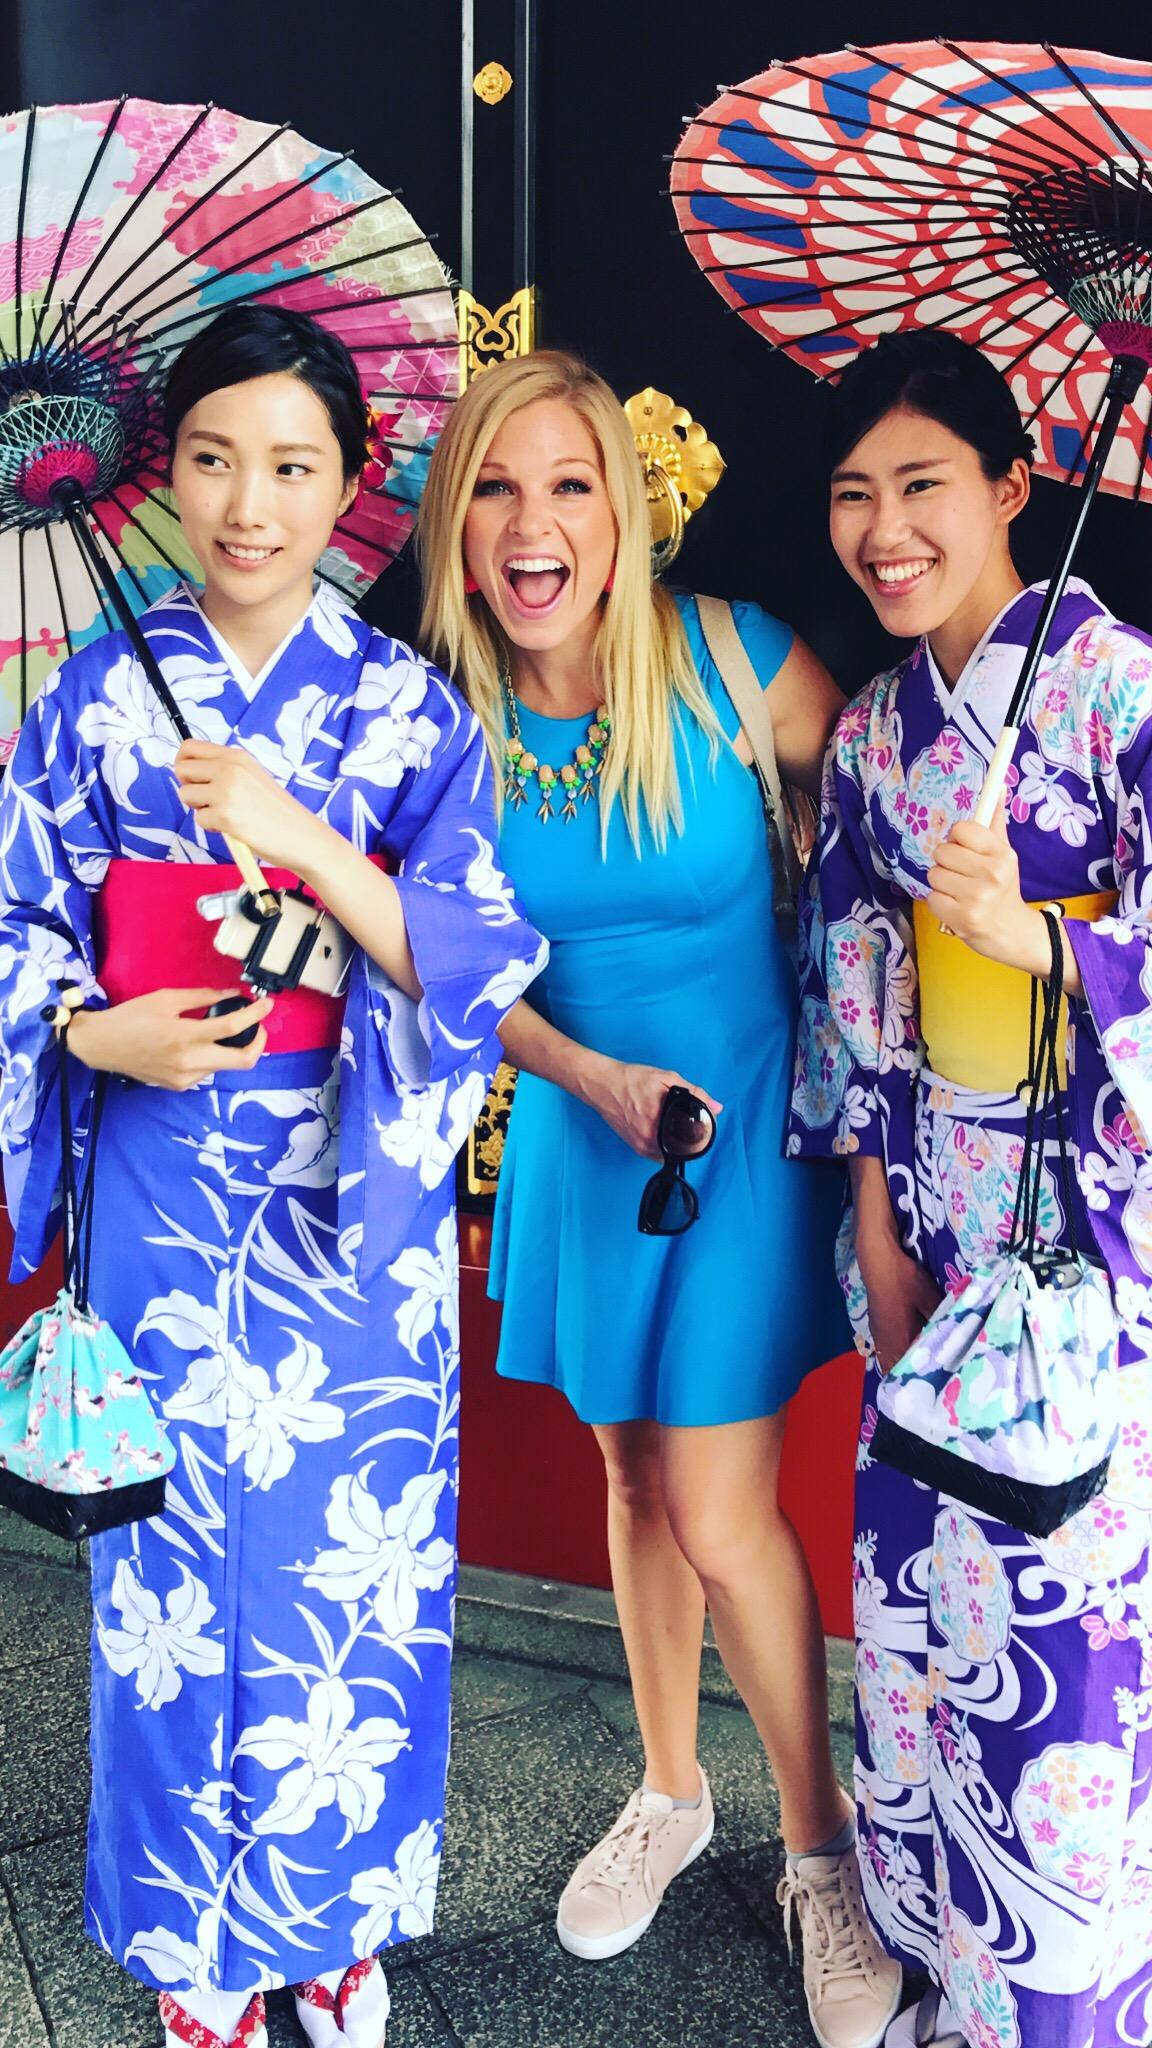 kimono japan kimonos japanese tokyo intercontinental anna kooiman annakooiman.com fitness travel lifestyle fashion where to stay in tokyo things to do in tokyo places to eat in tokyo best hotel in tokyo fitness travel lifestyle fashion television